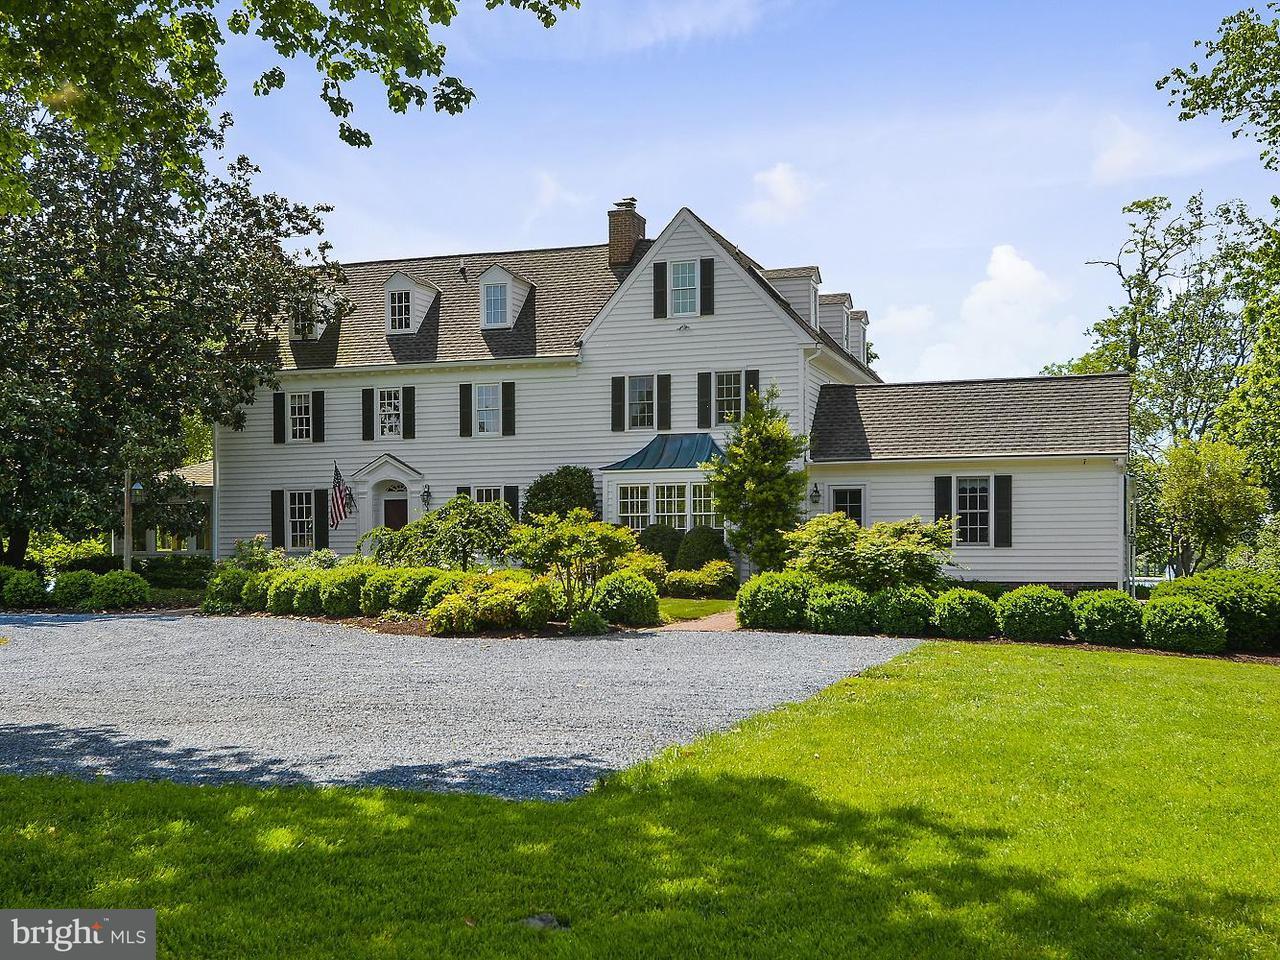 Single Family Home for Sale at 27134 ENNISKILLEN Road 27134 ENNISKILLEN Road Easton, Maryland 21601 United States